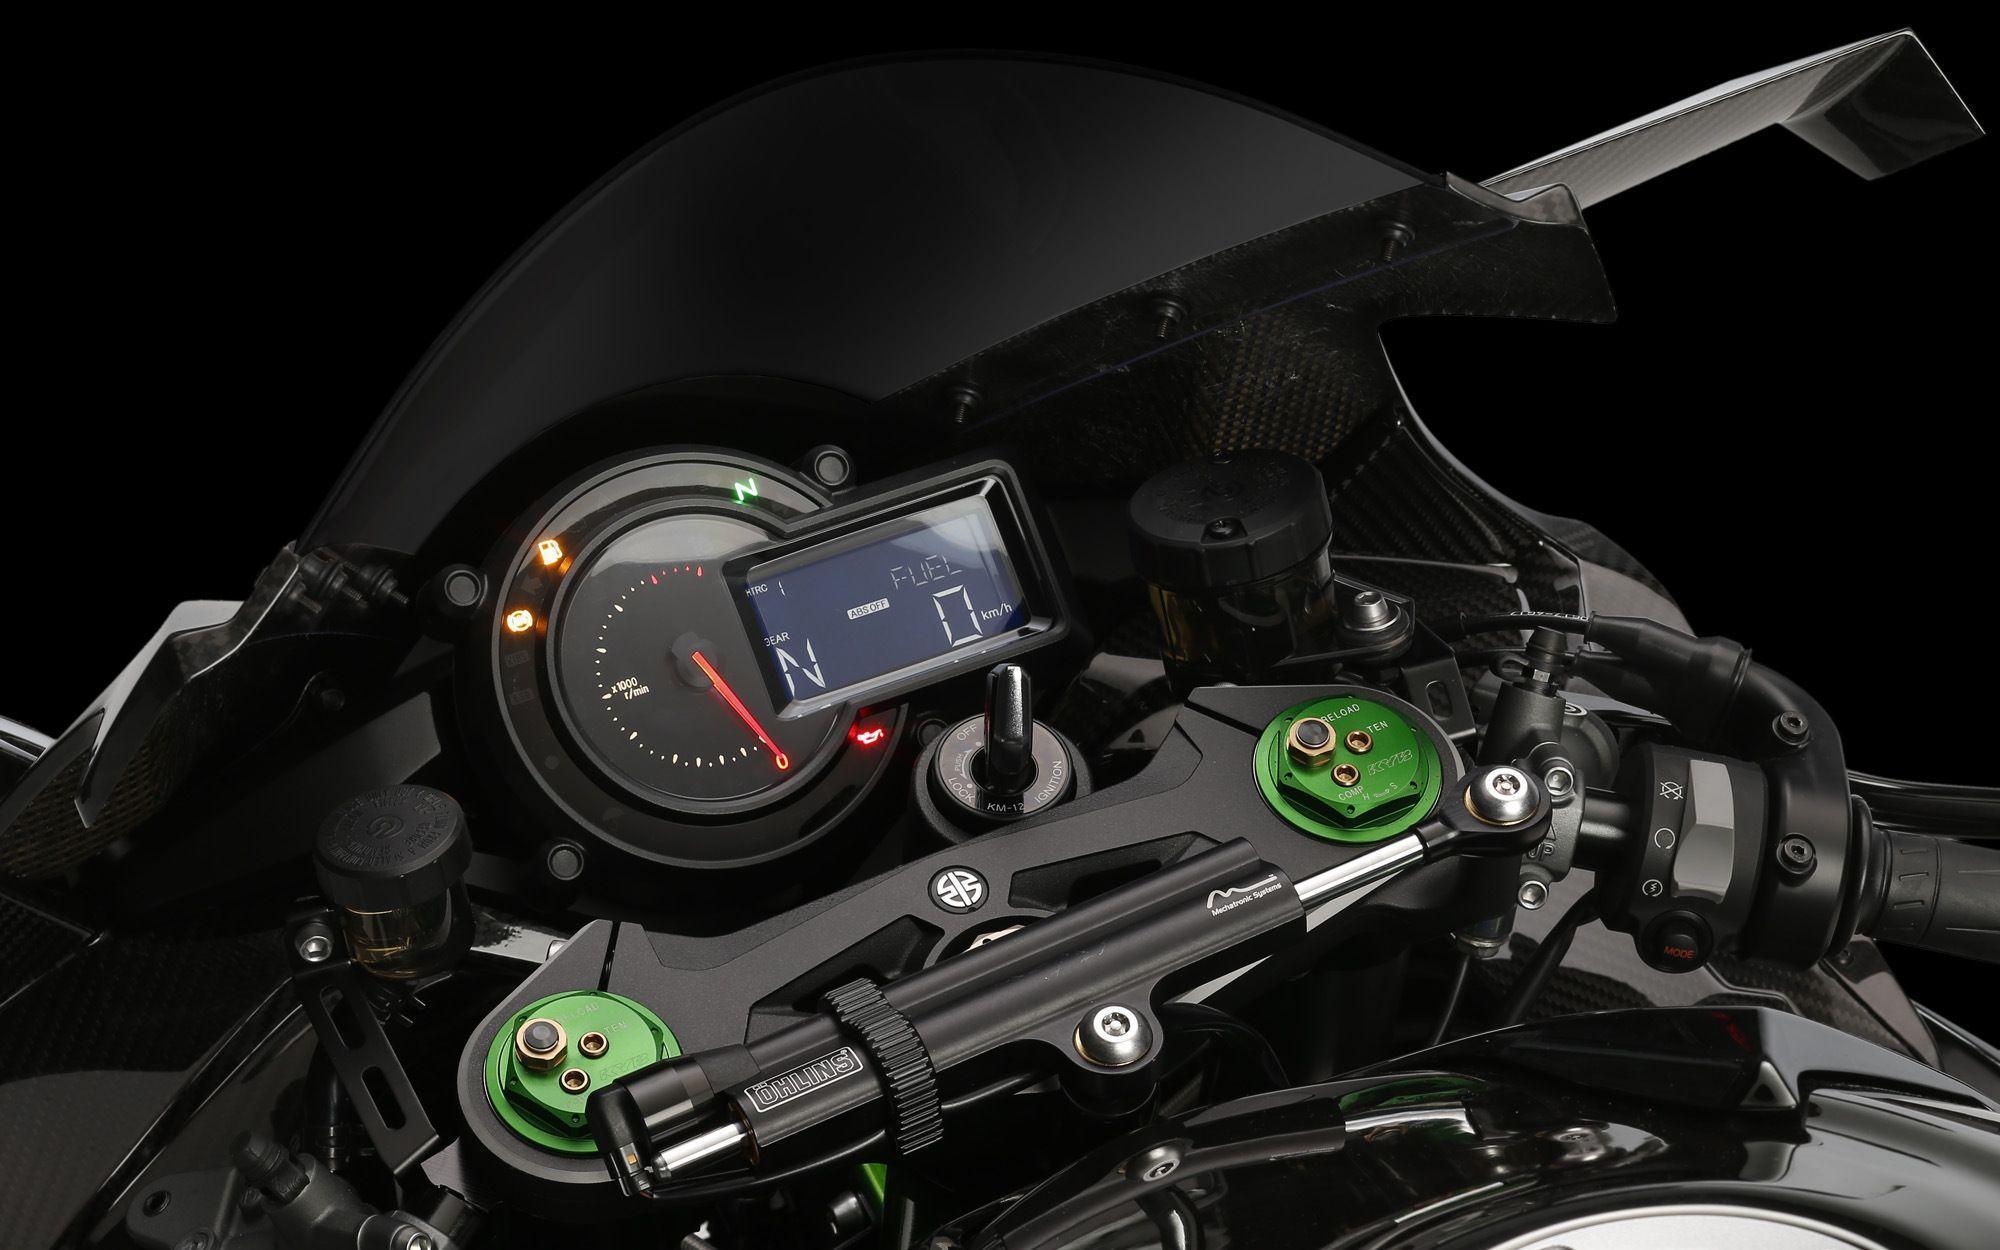 Kawasaki Ninja H2R Dashboard Moto HD Wallpaper | Projects to Try ...